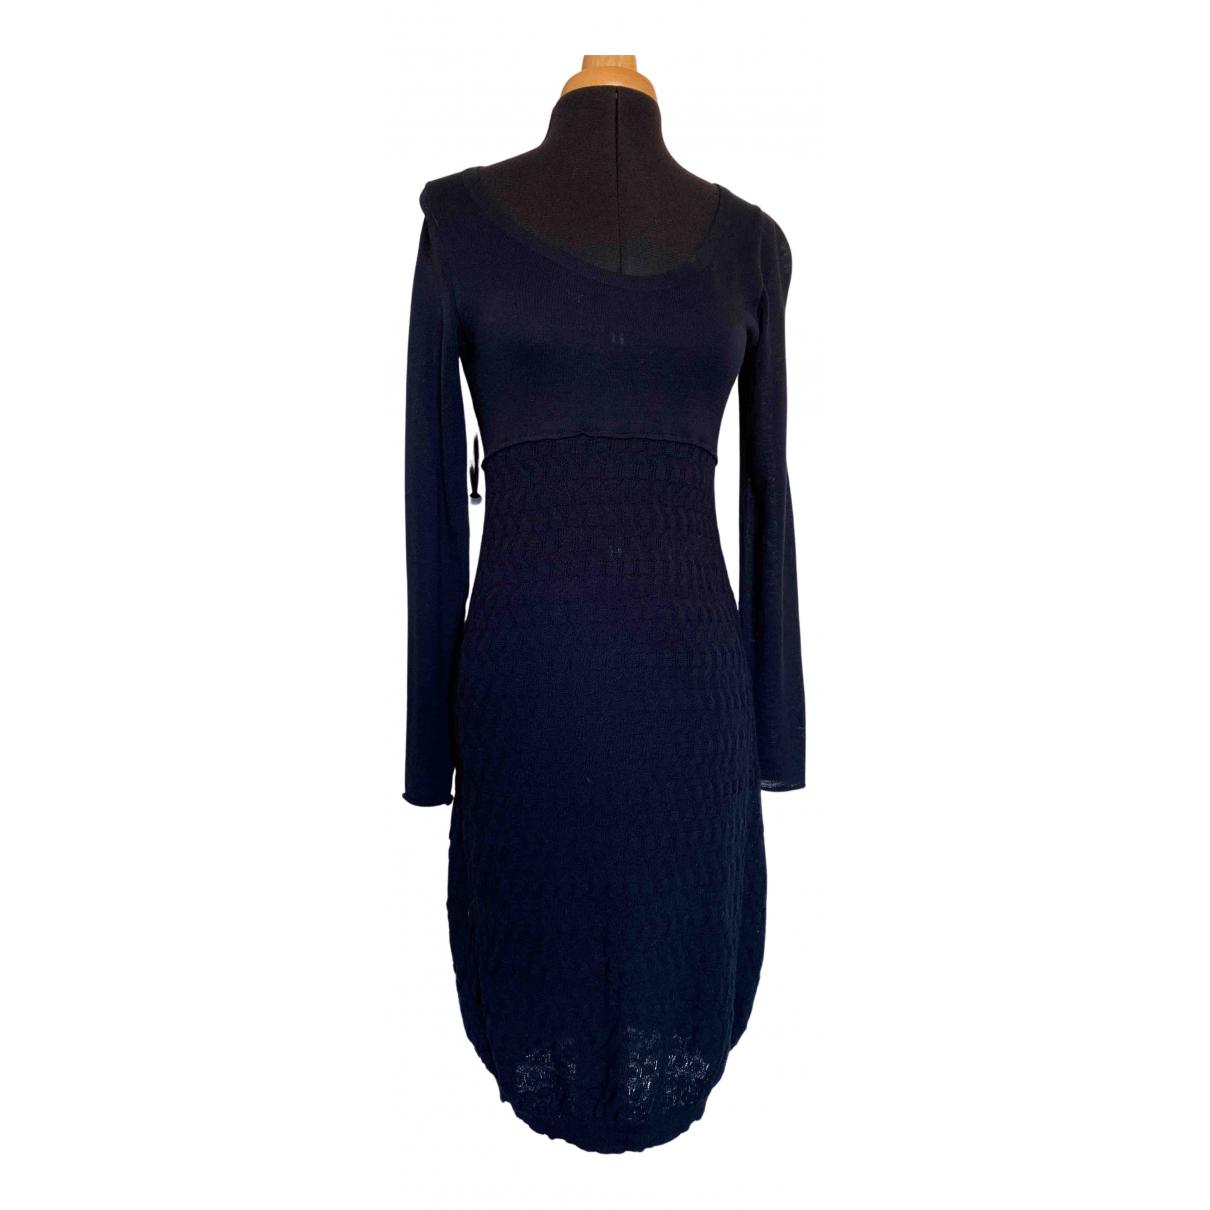 Falconeri N Blue Cotton dress for Women S International